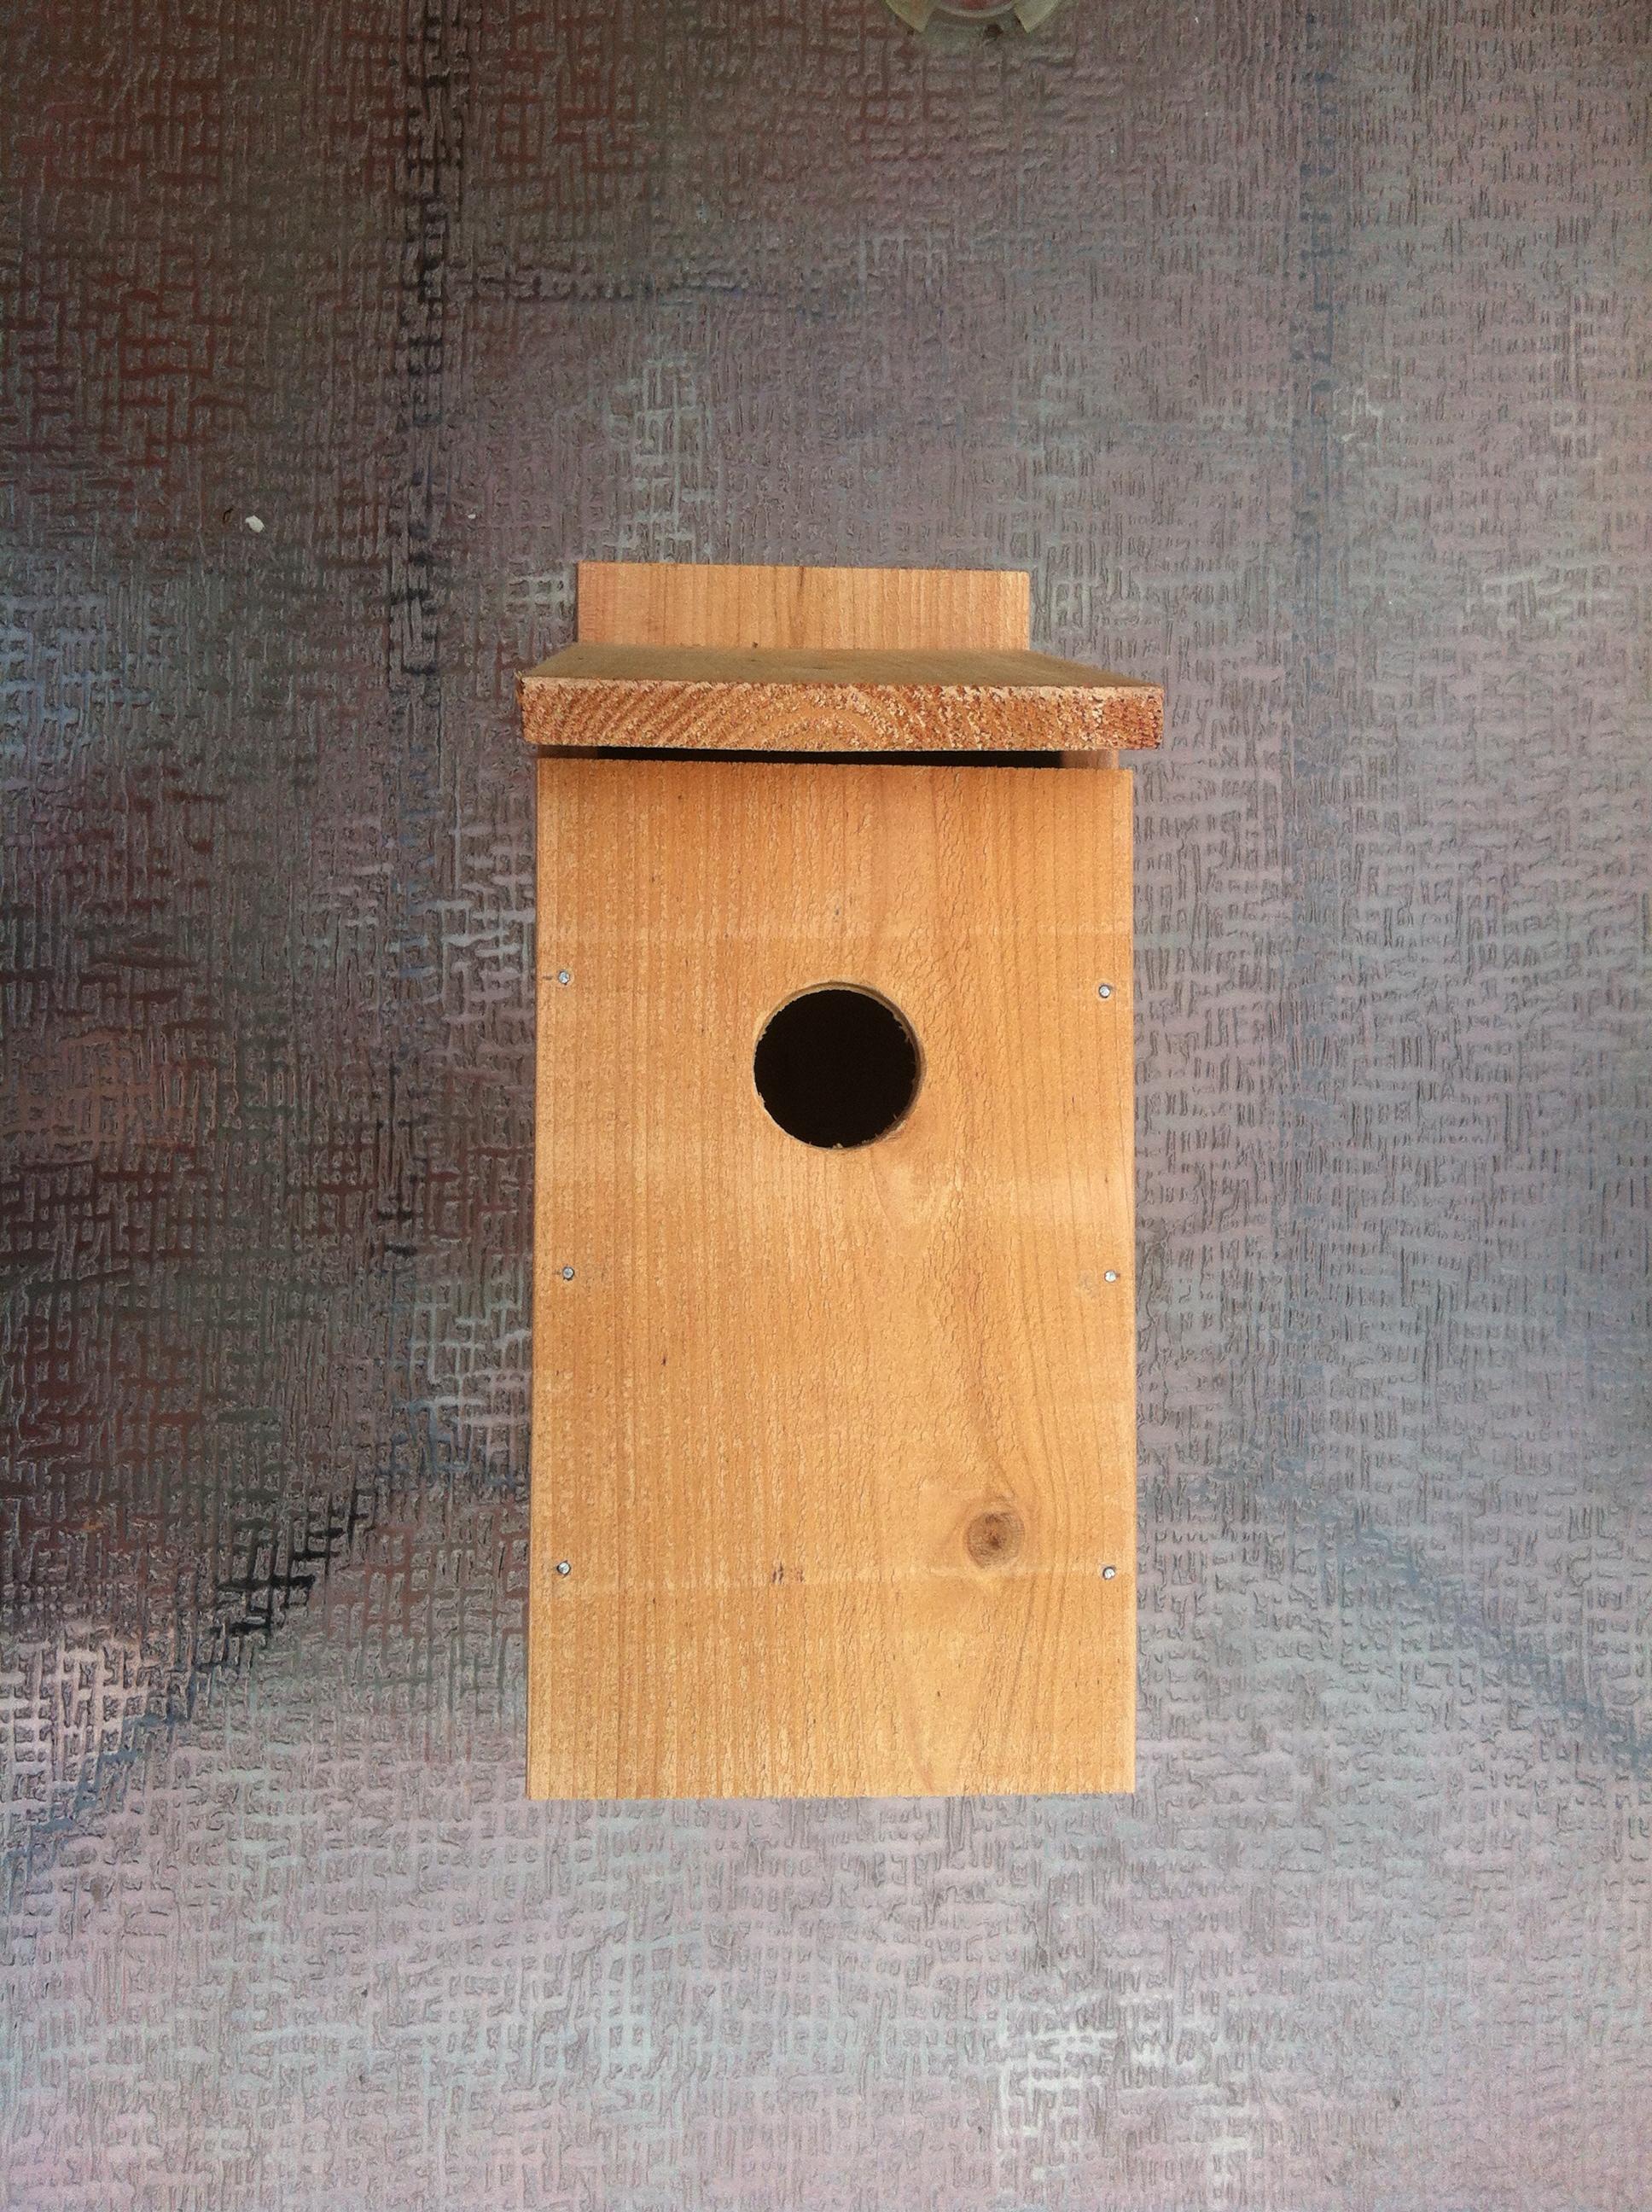 Bluebird house diy kit solutioingenieria Gallery